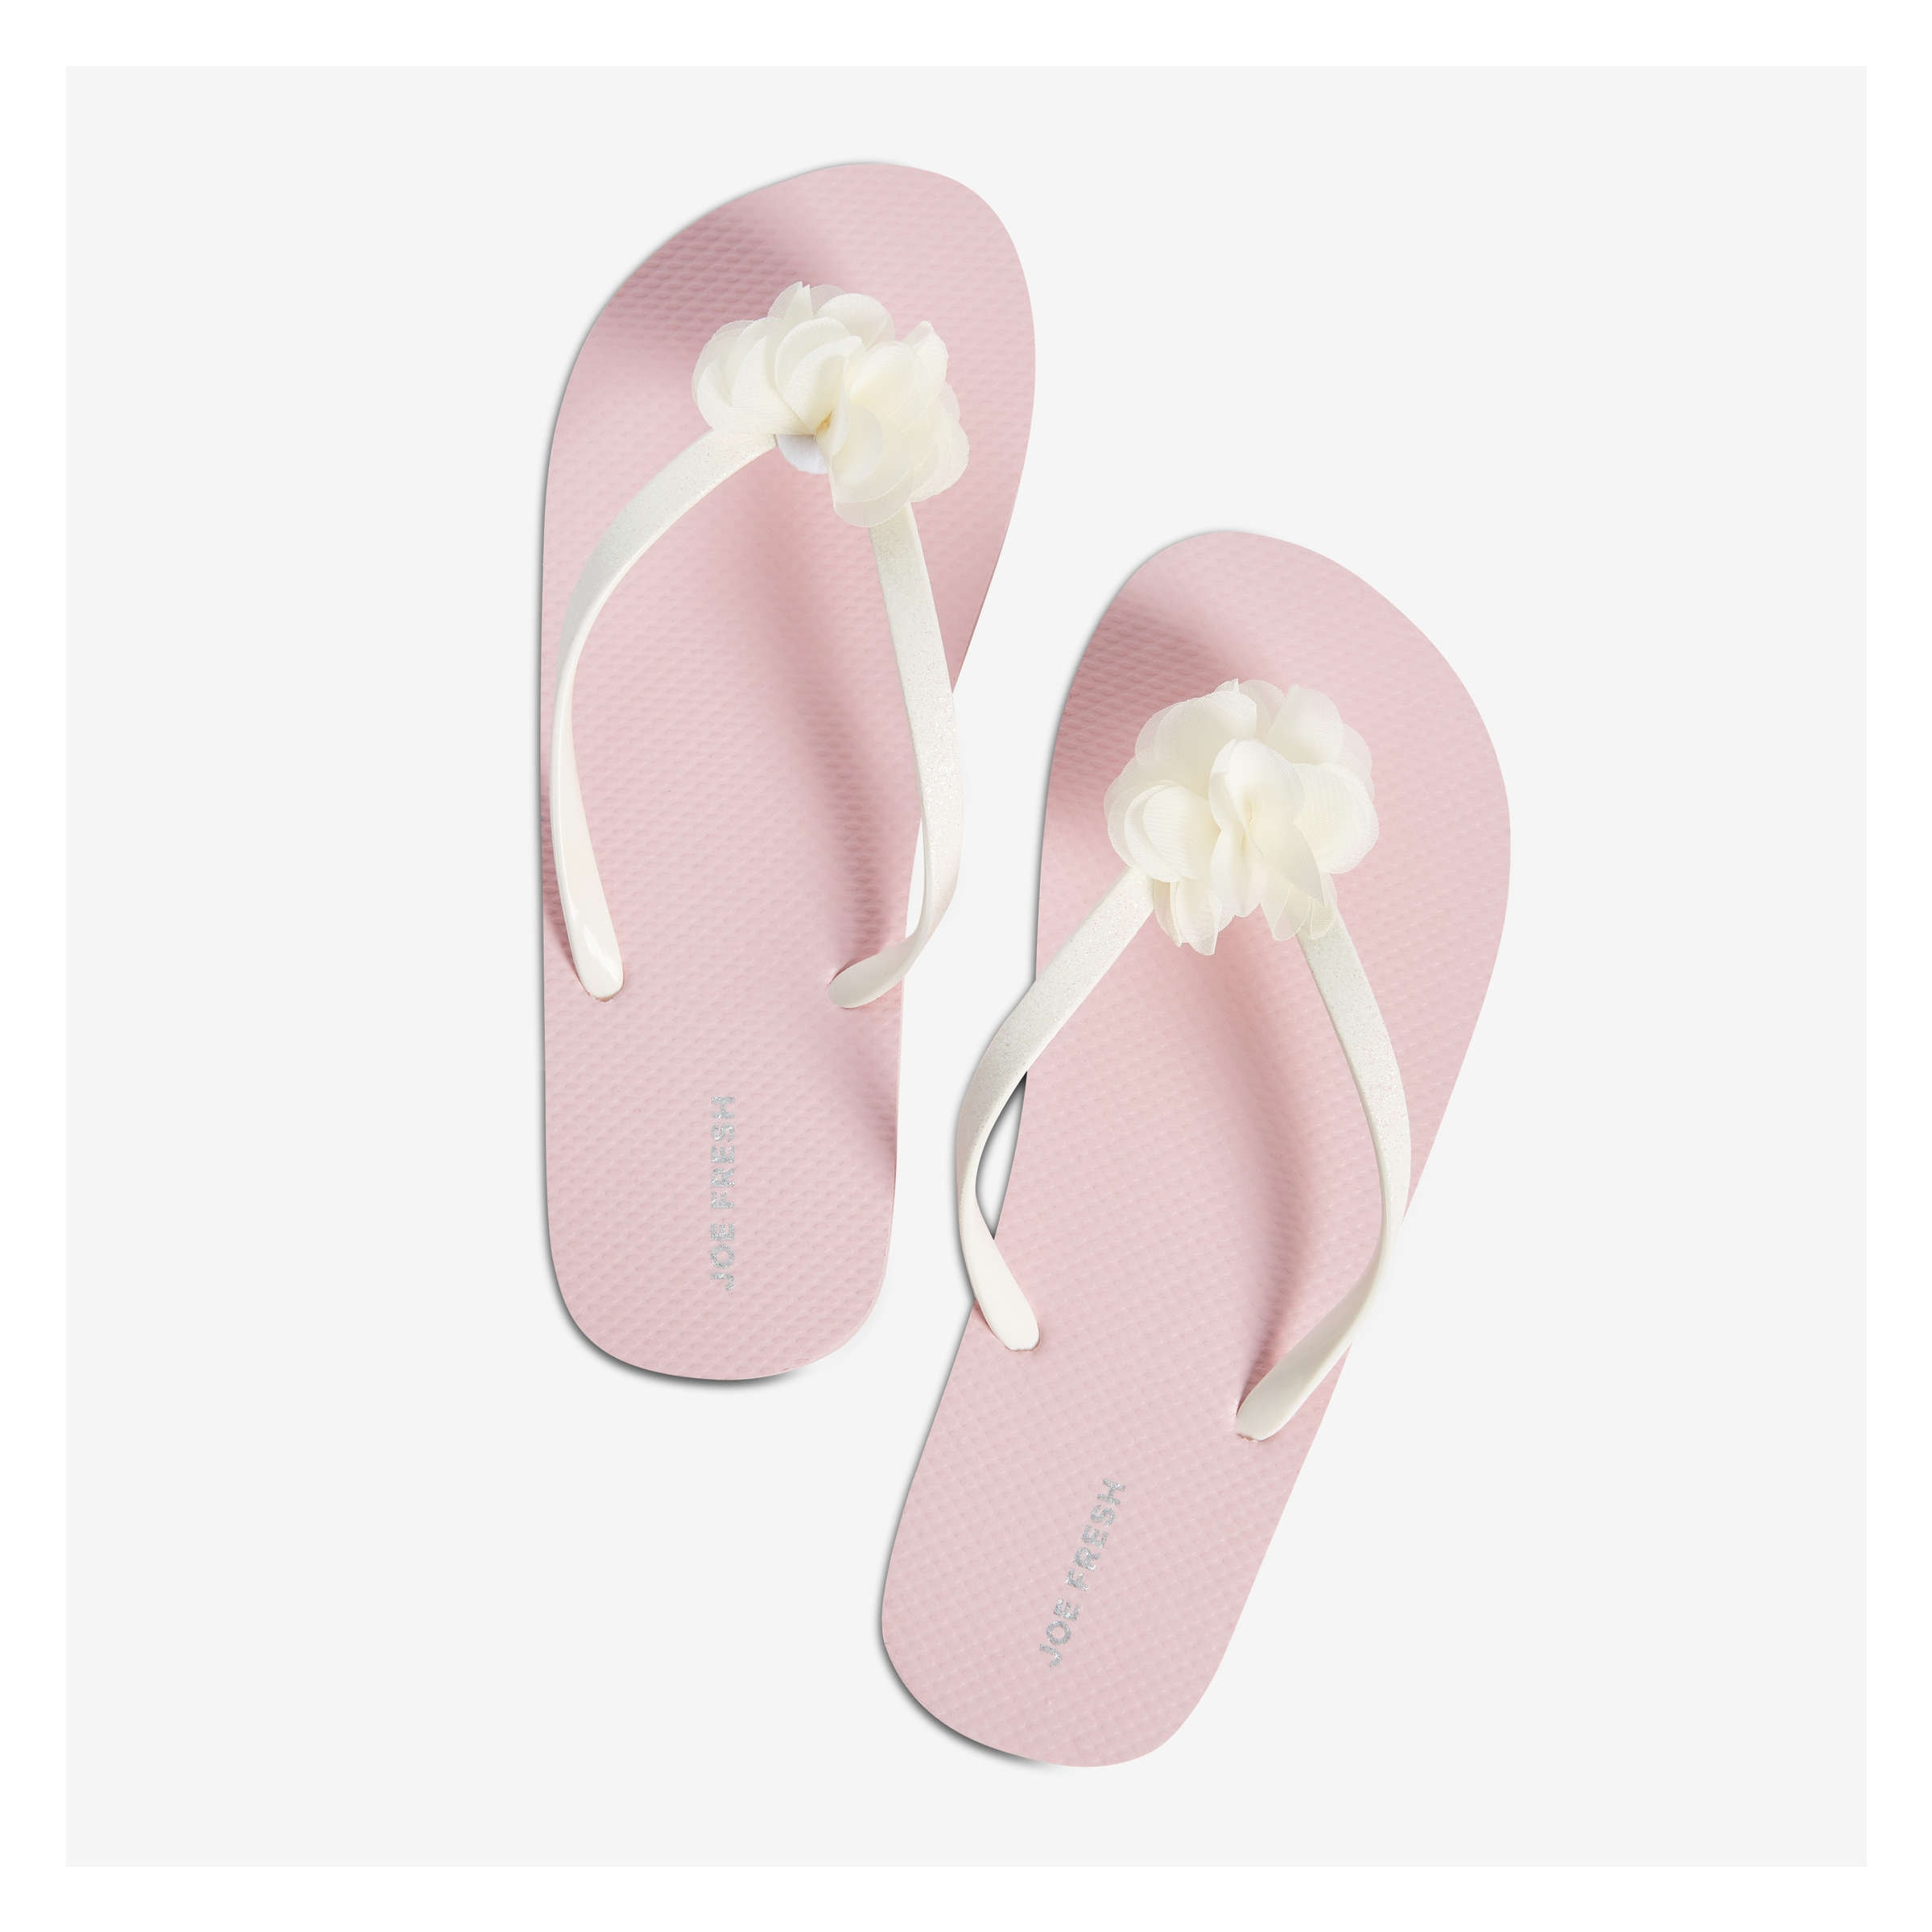 bc0b4d27f8c Kid Girls  Thong Strap Flip Flops in Light Pink from Joe Fresh